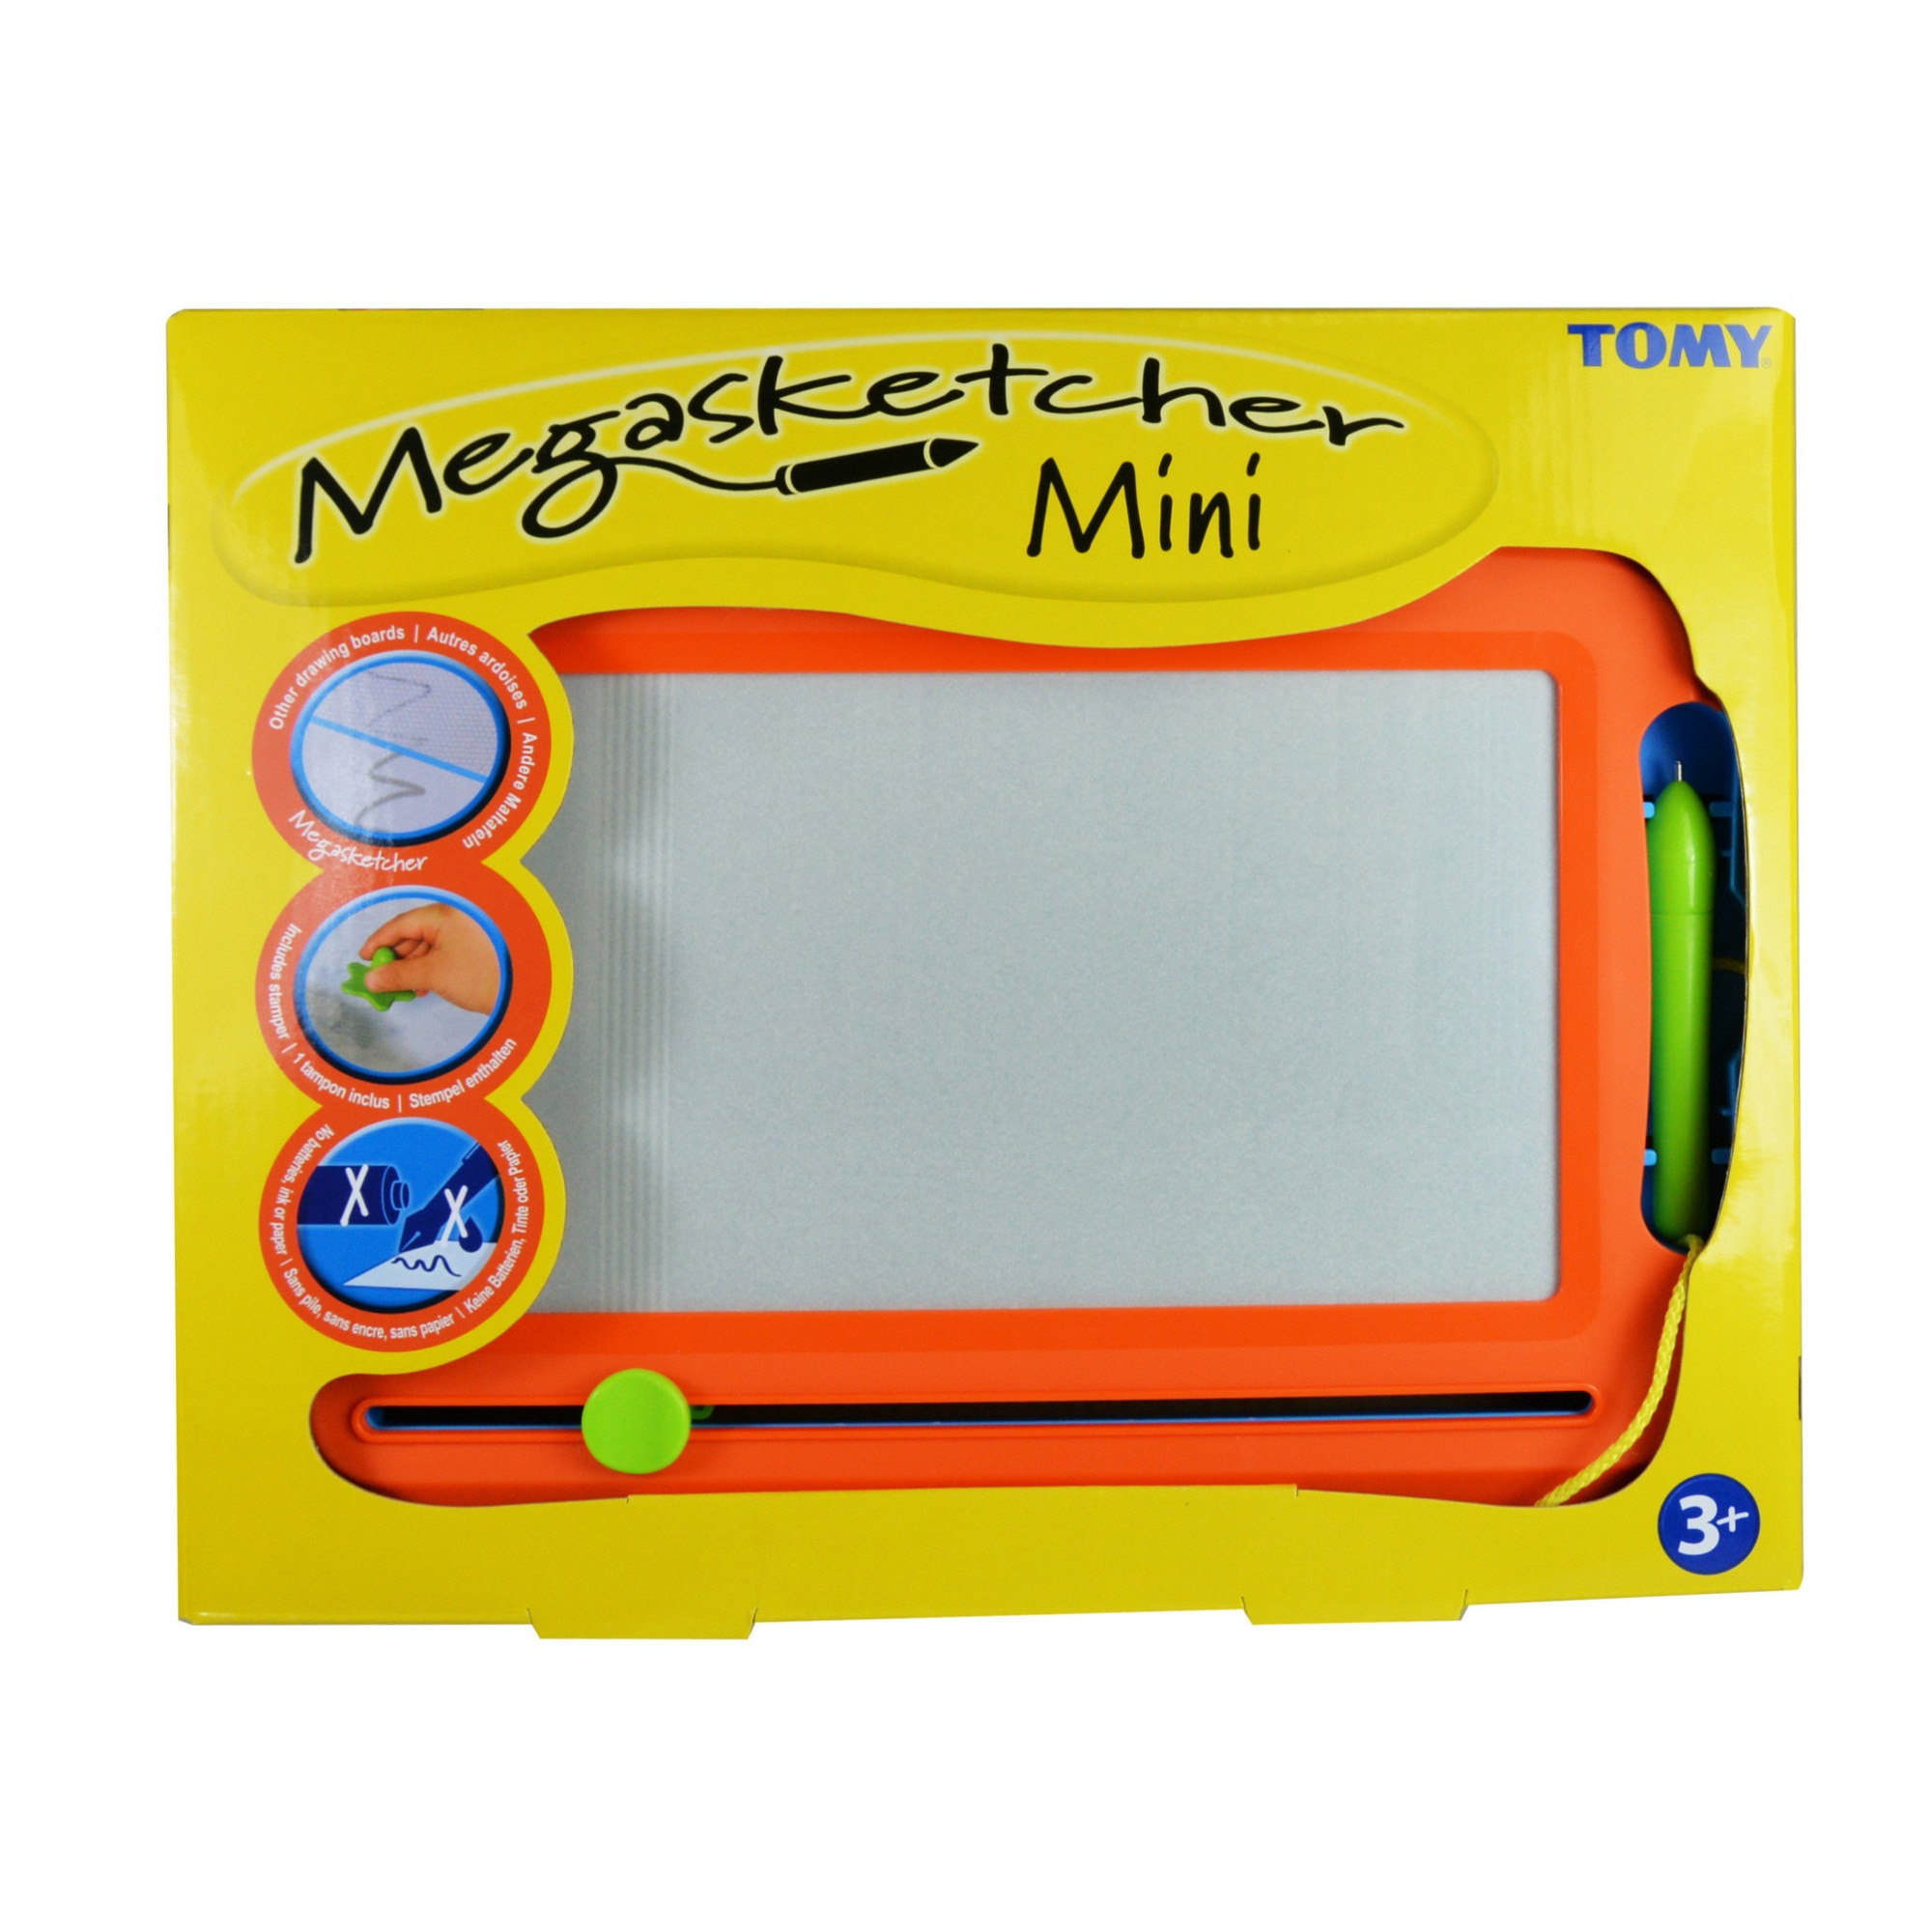 Fotografie Tablita magnetica Tomy - Megasketcher Mini